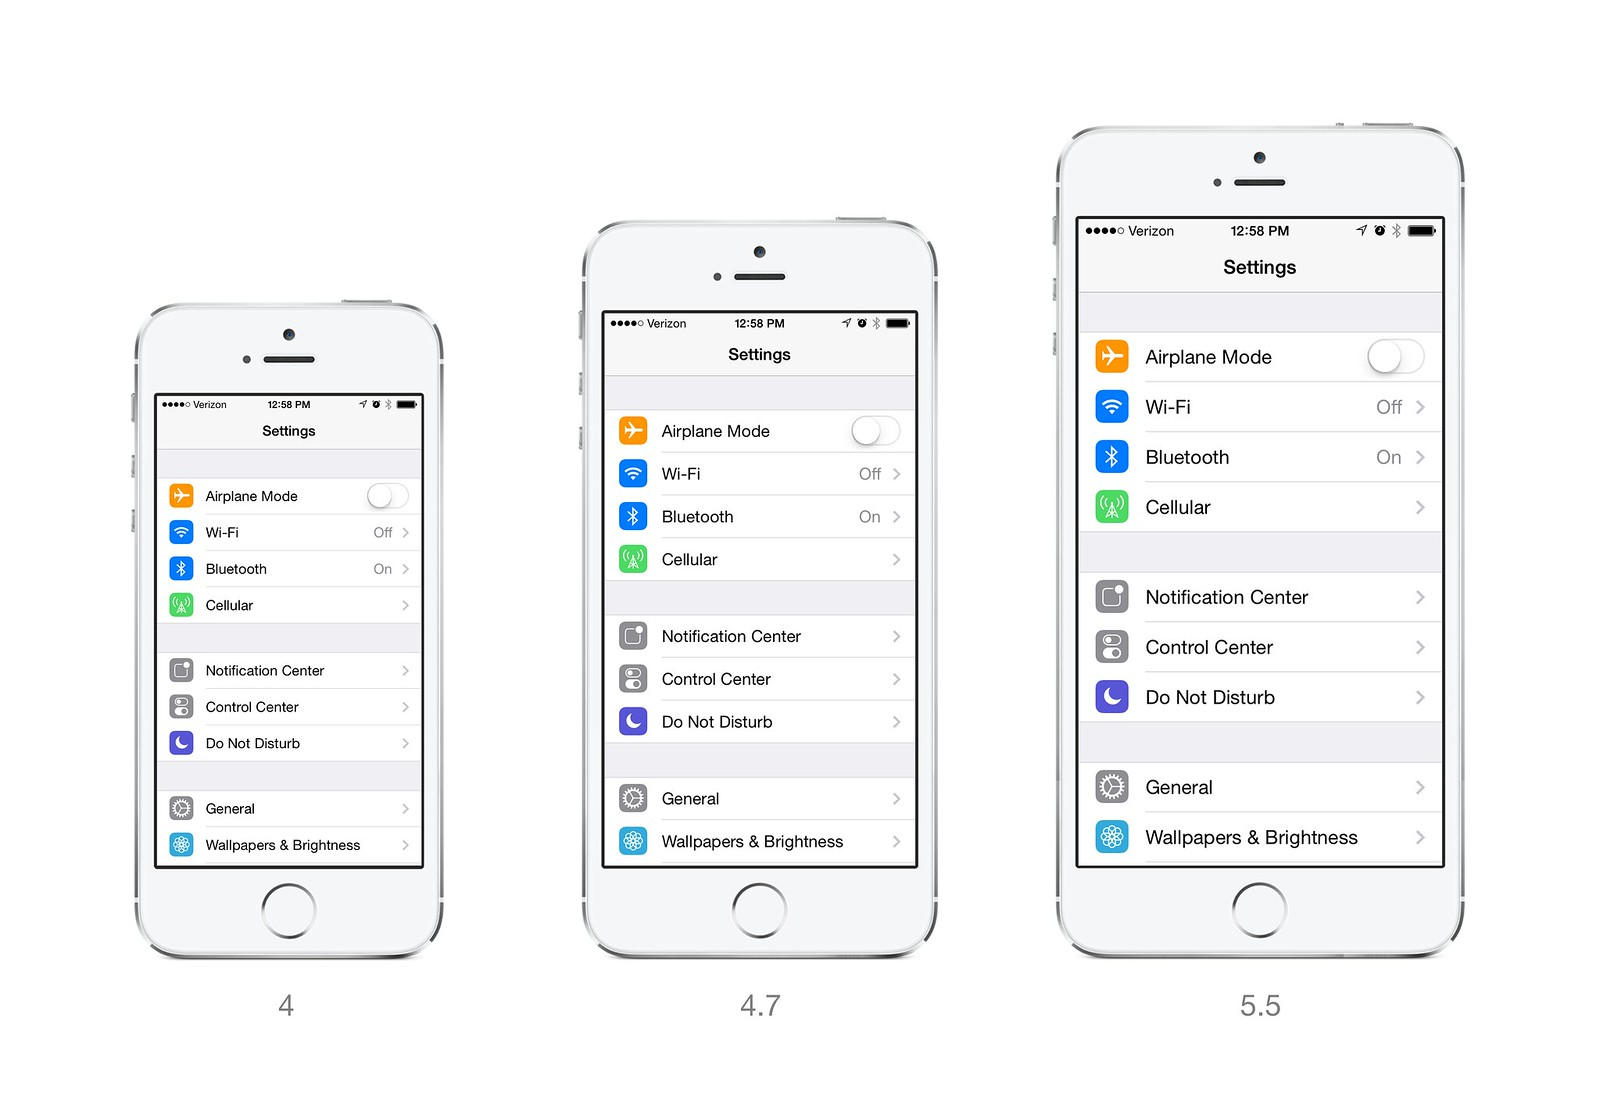 iPhone 6 Larger Text